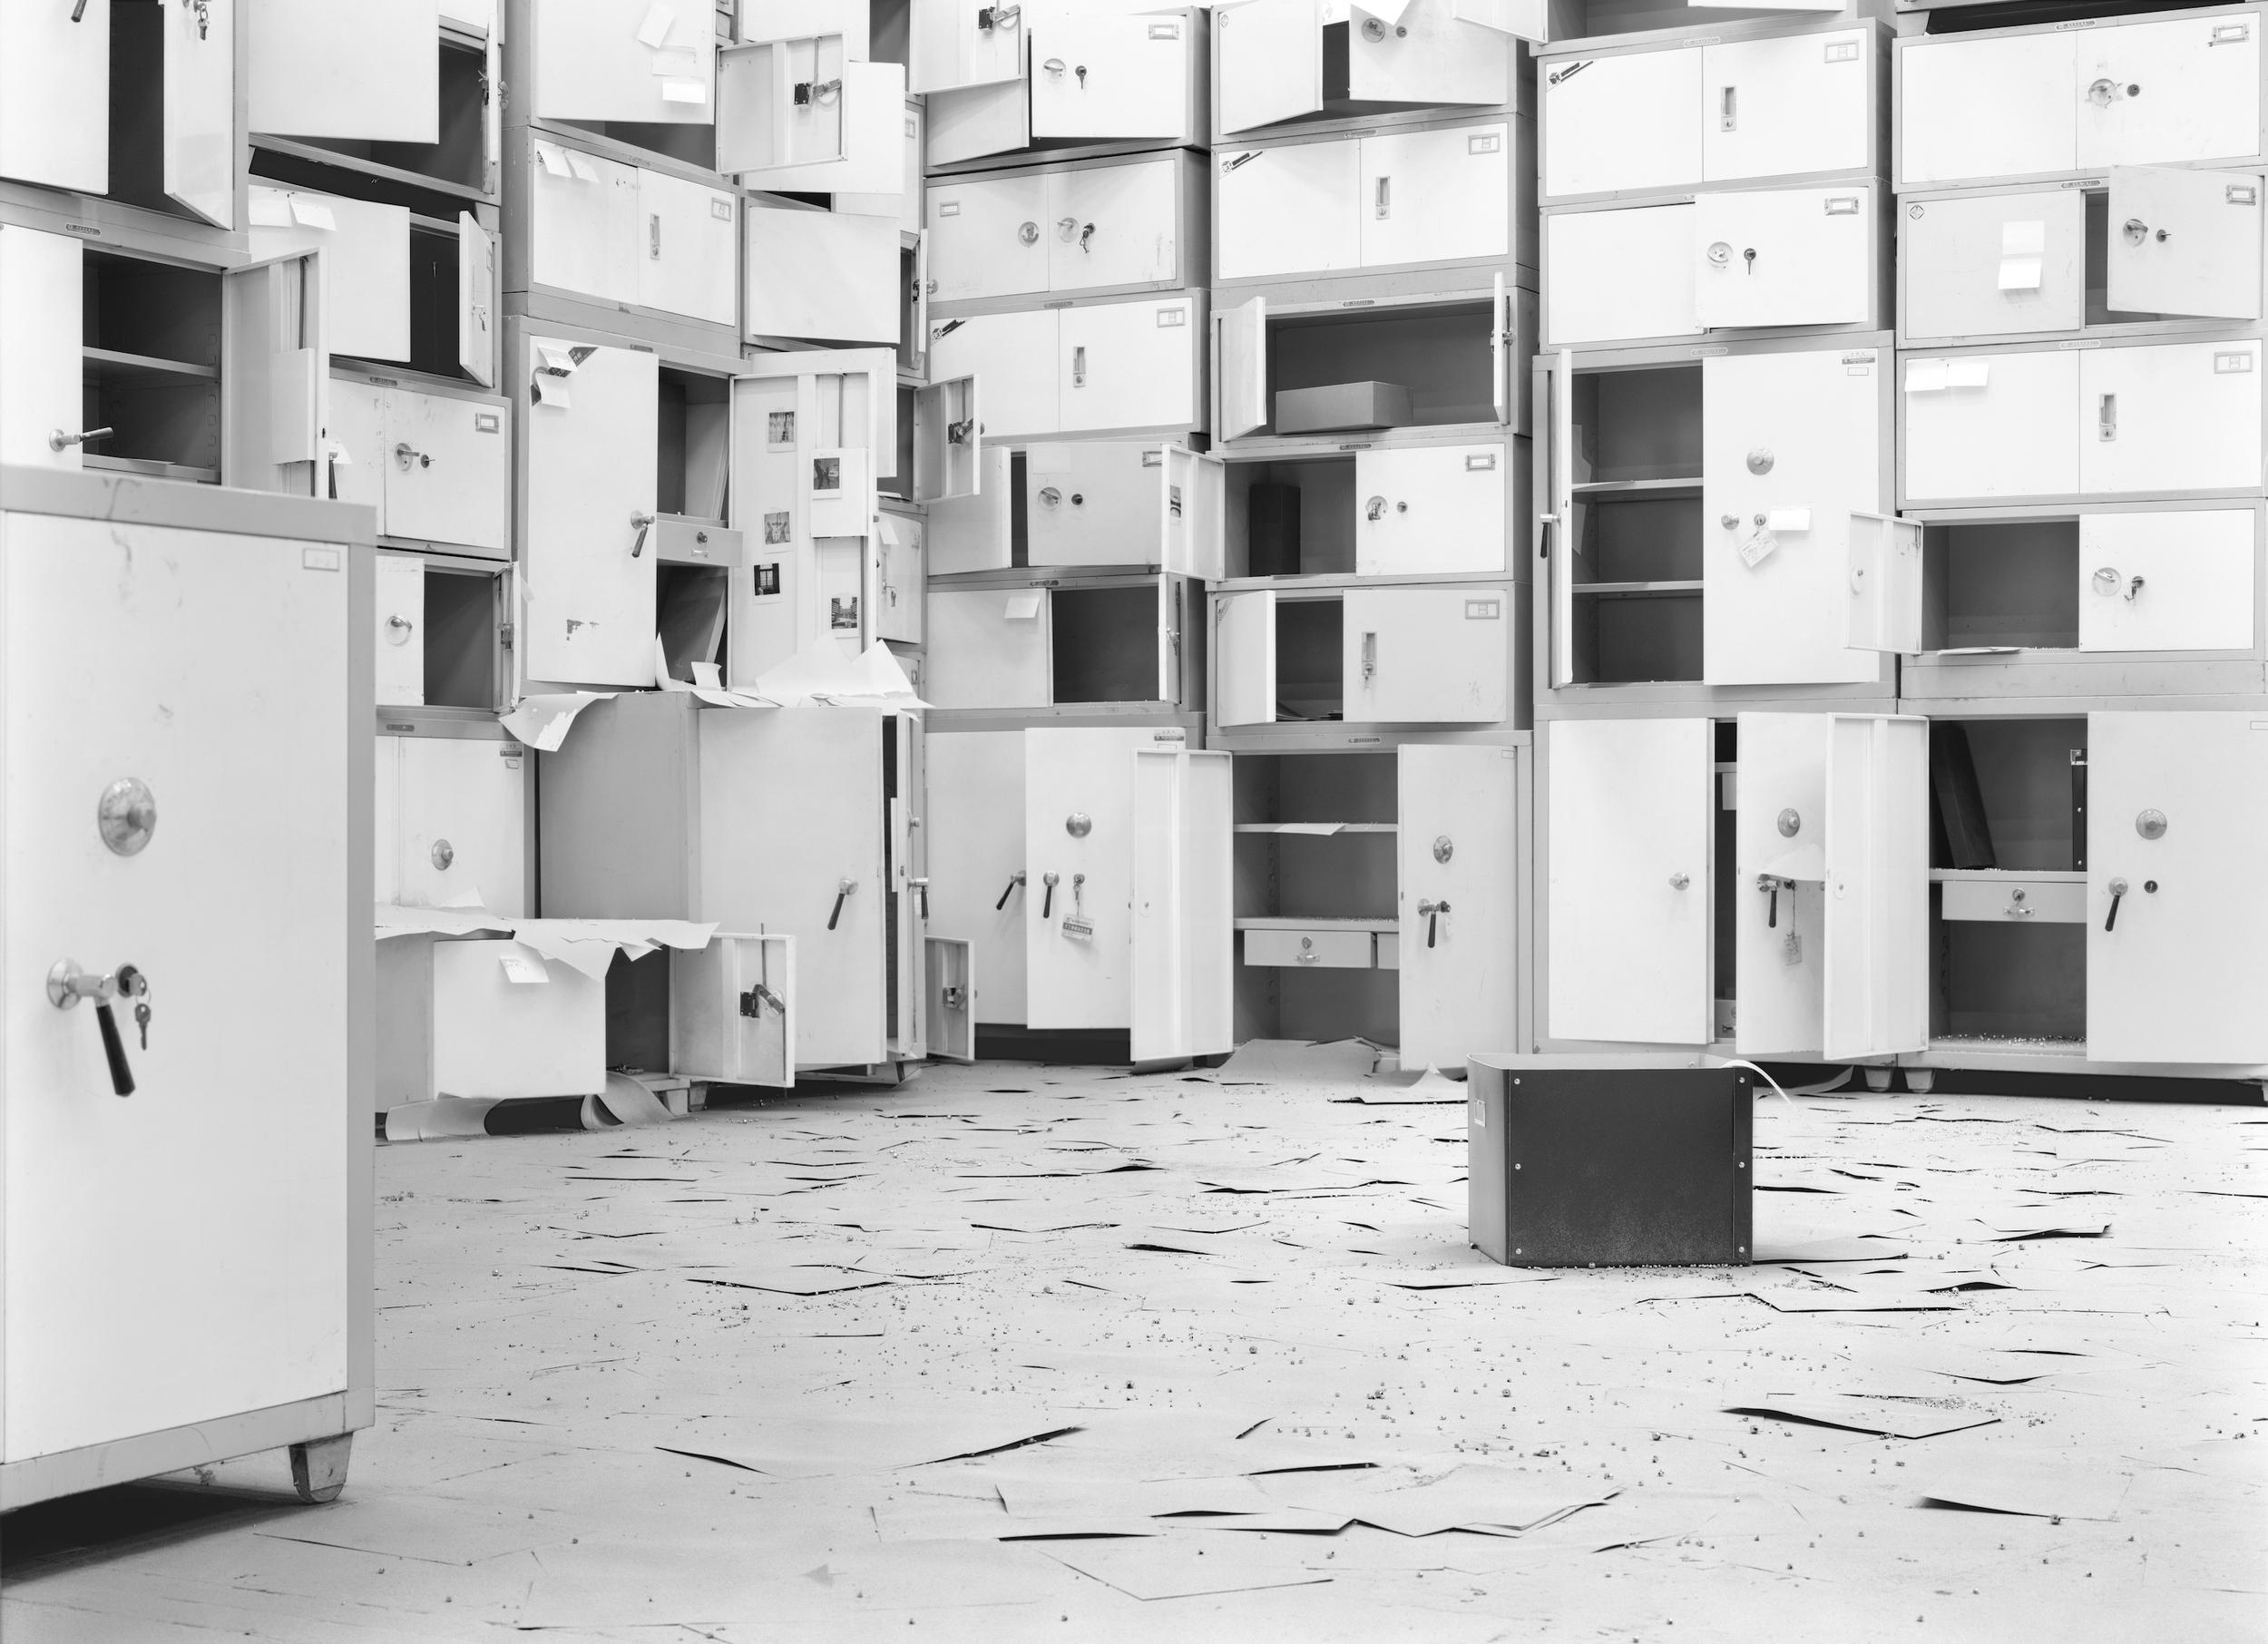 Ji Zhou 计洲, Dust No.7 尘之七, 2012, Ultra Giclee 艺术微喷, 150 x 207 cm